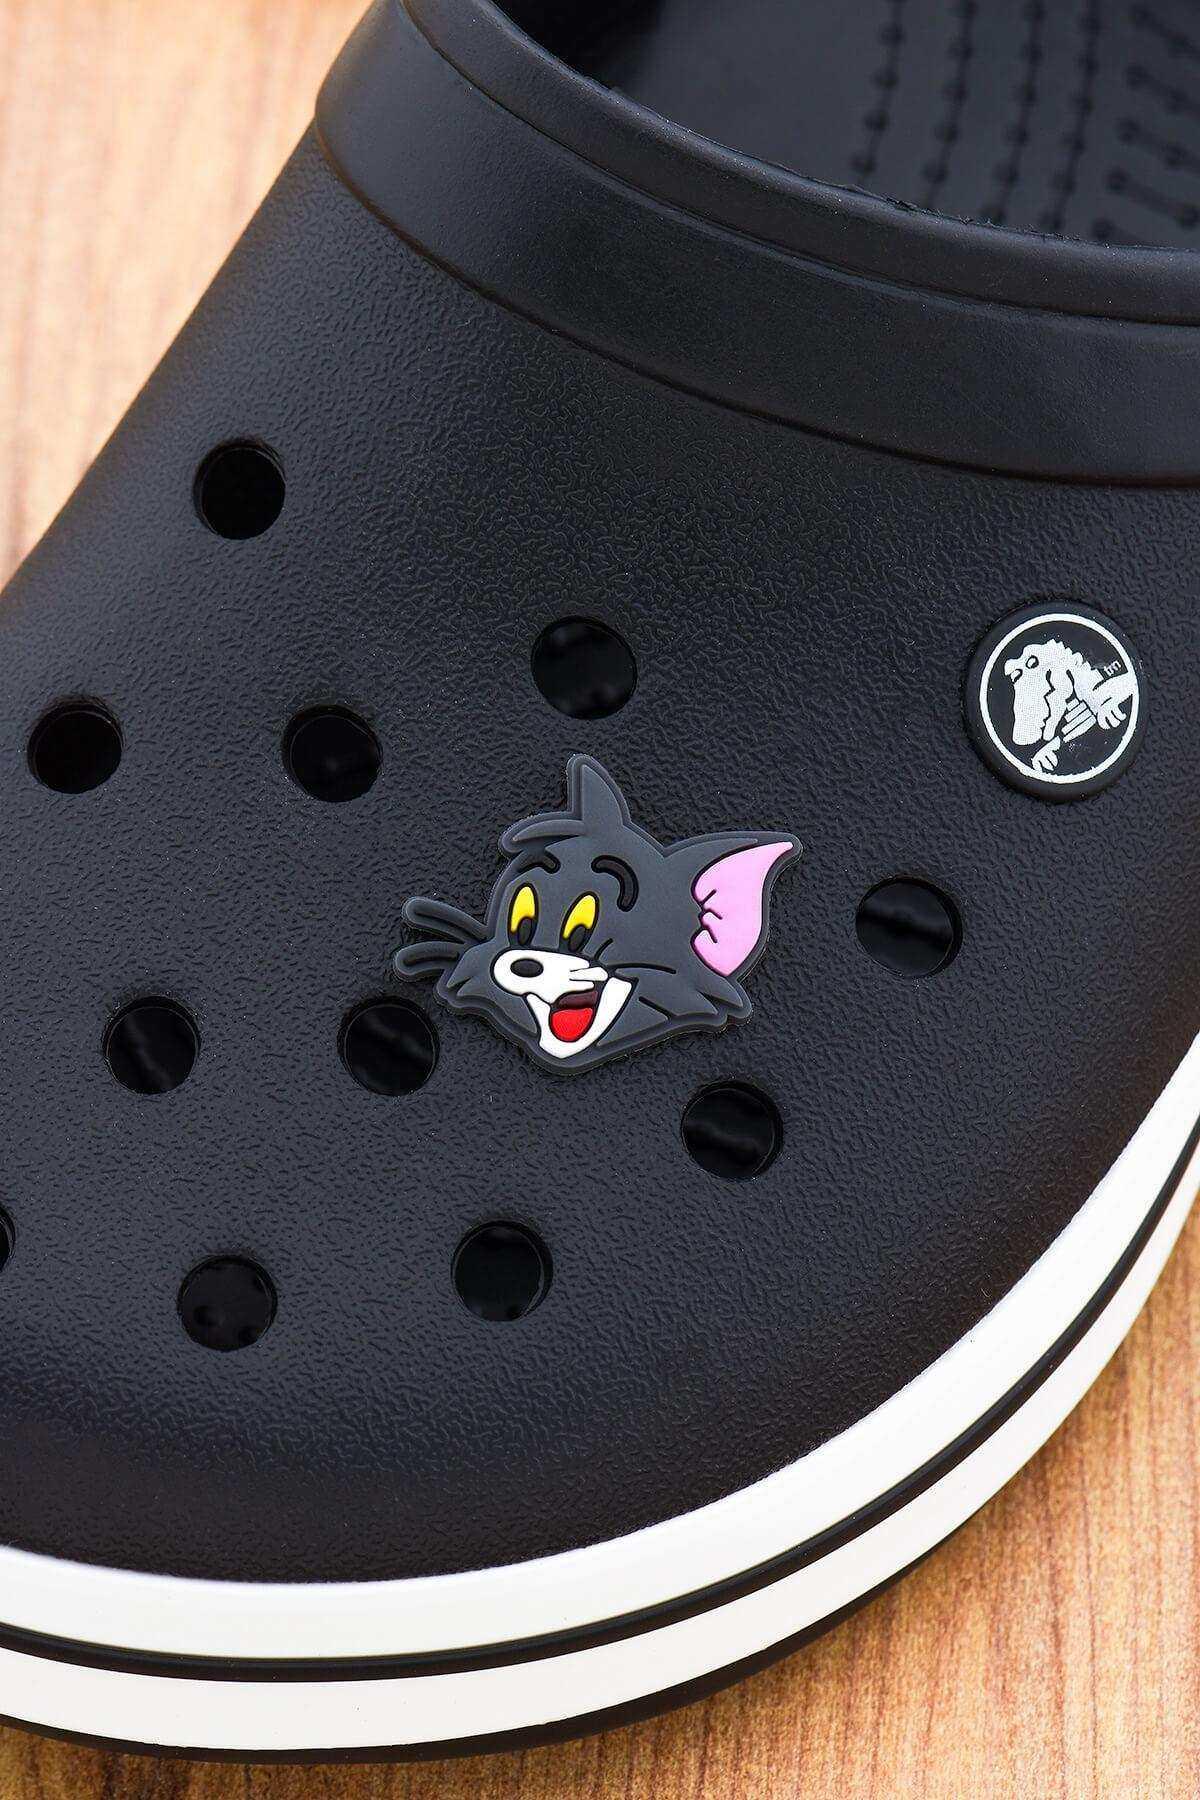 Tom ve Jerry Jibbitz Crocs Terlik Süsü Charm Terlik Aksesuarı - CRS0013